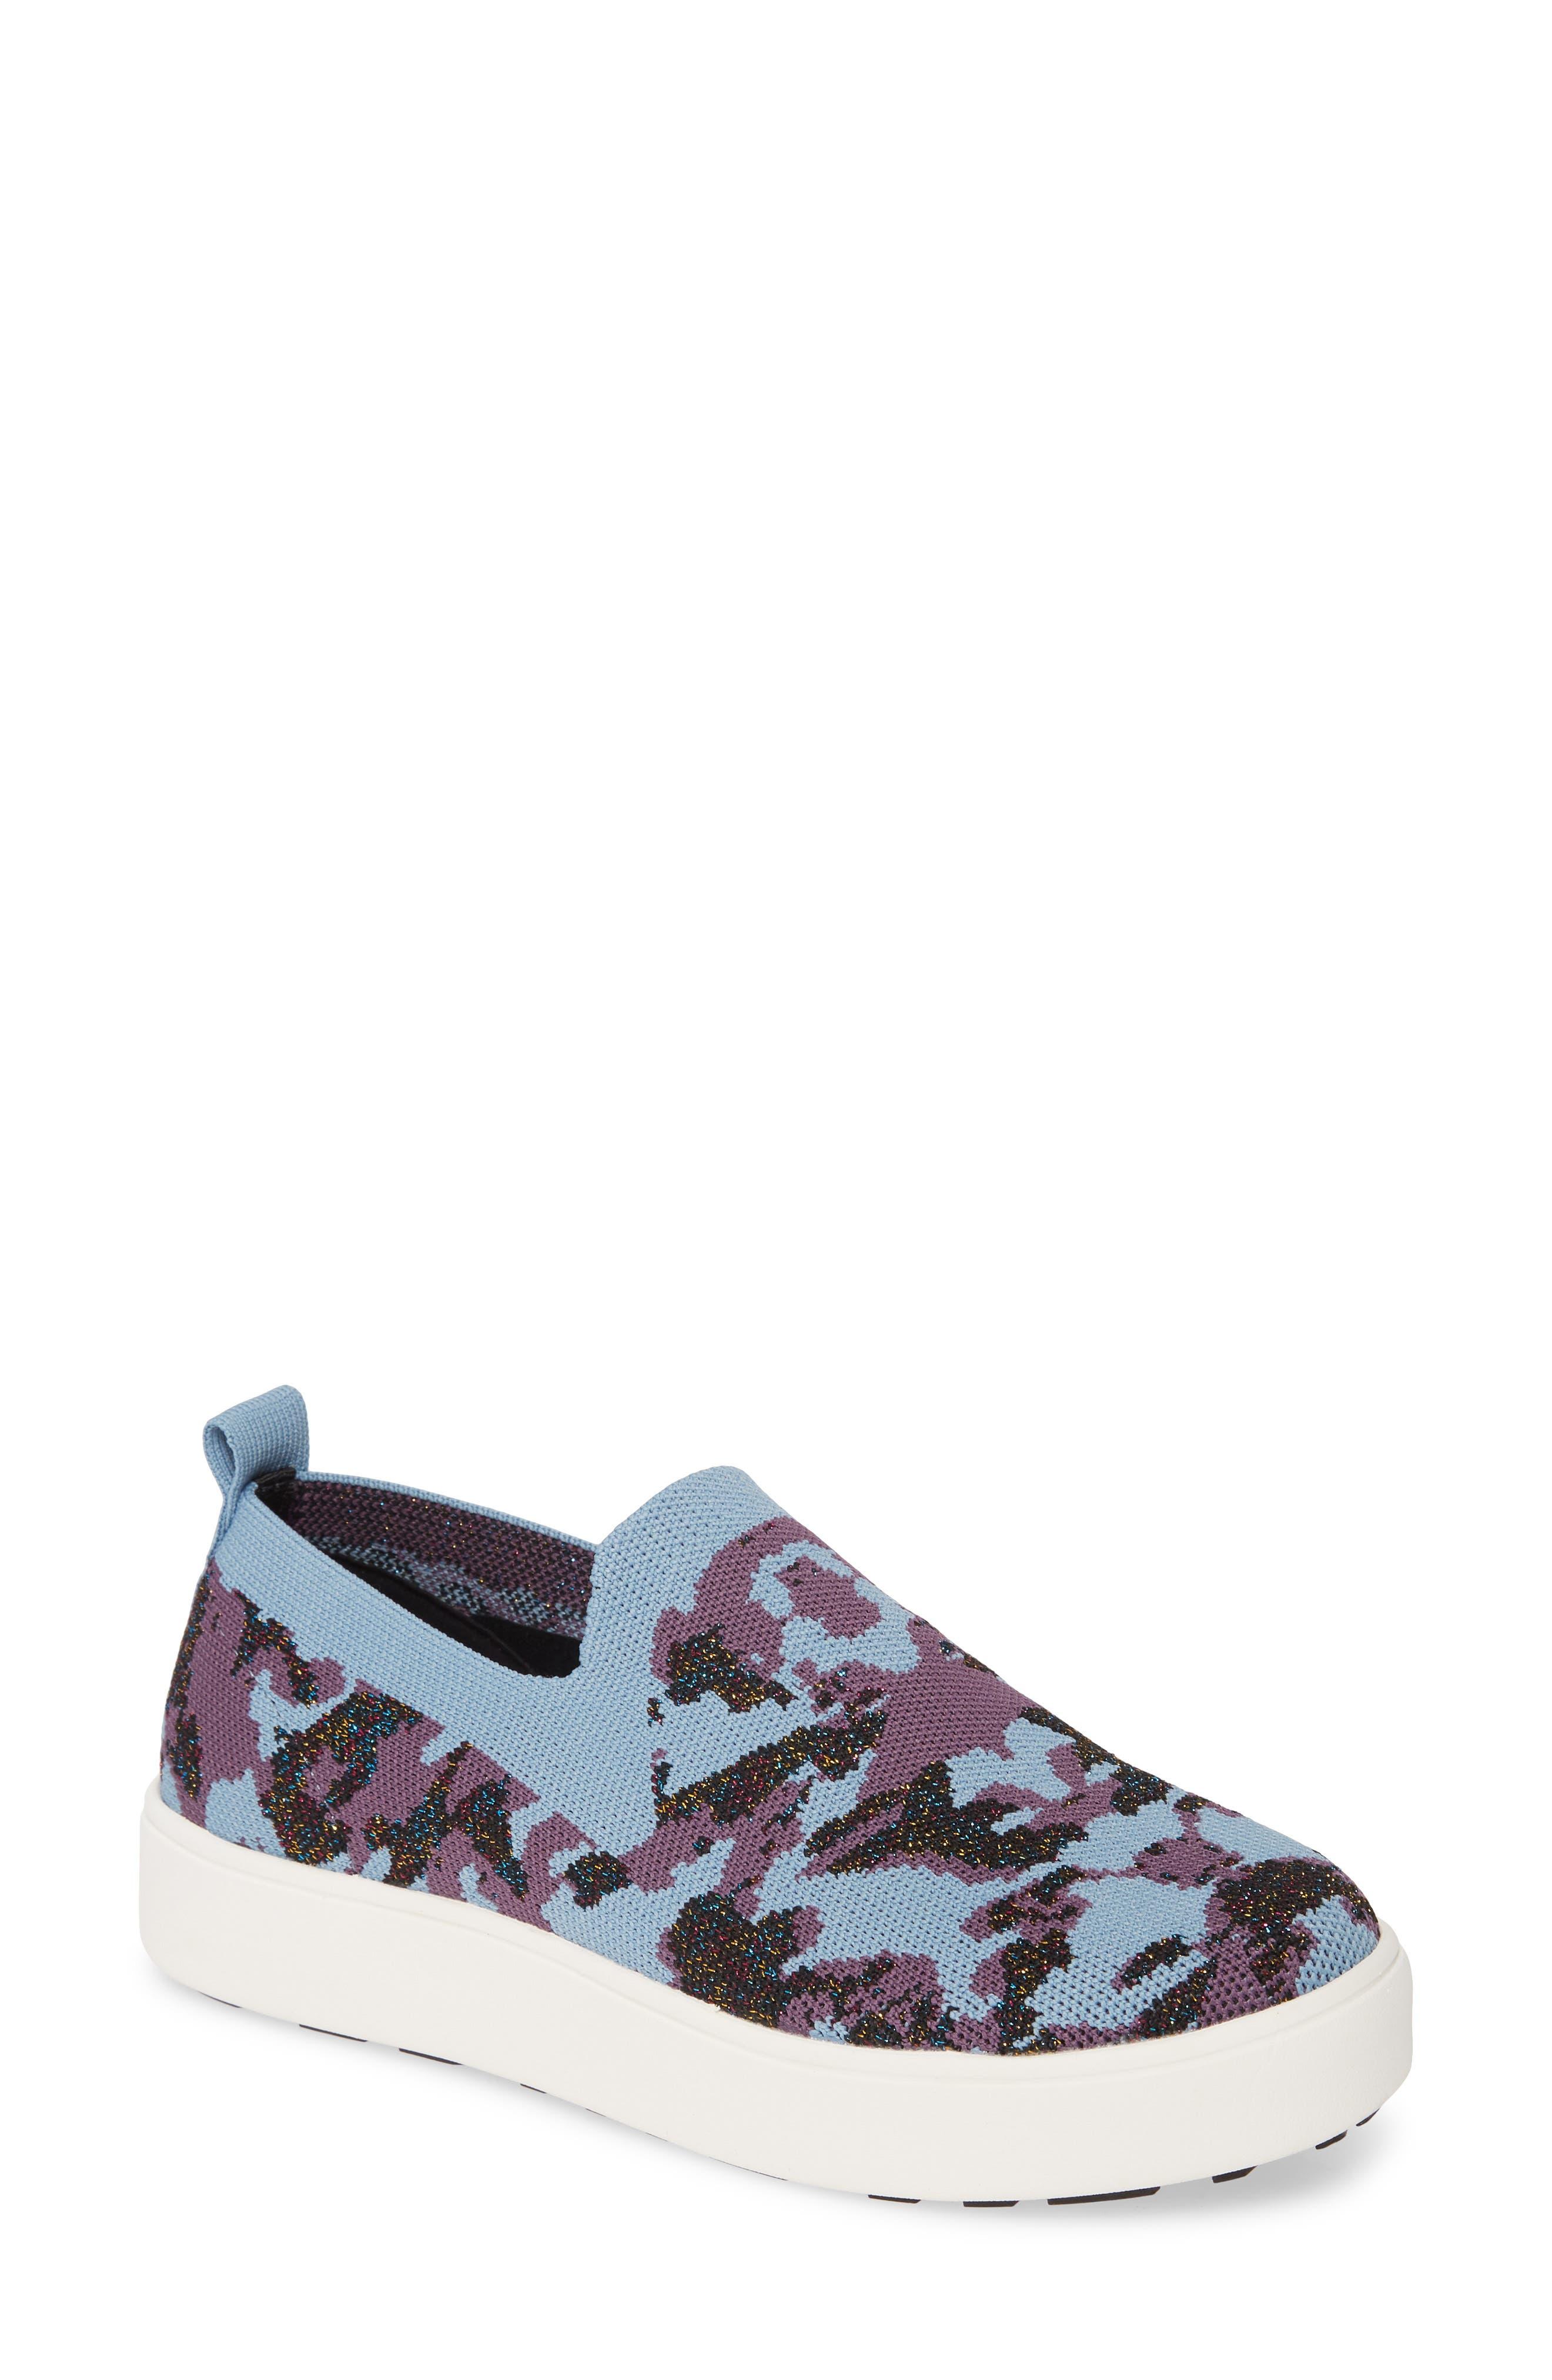 Bernie Mev. Jenna Slip-On Sneaker, Blue